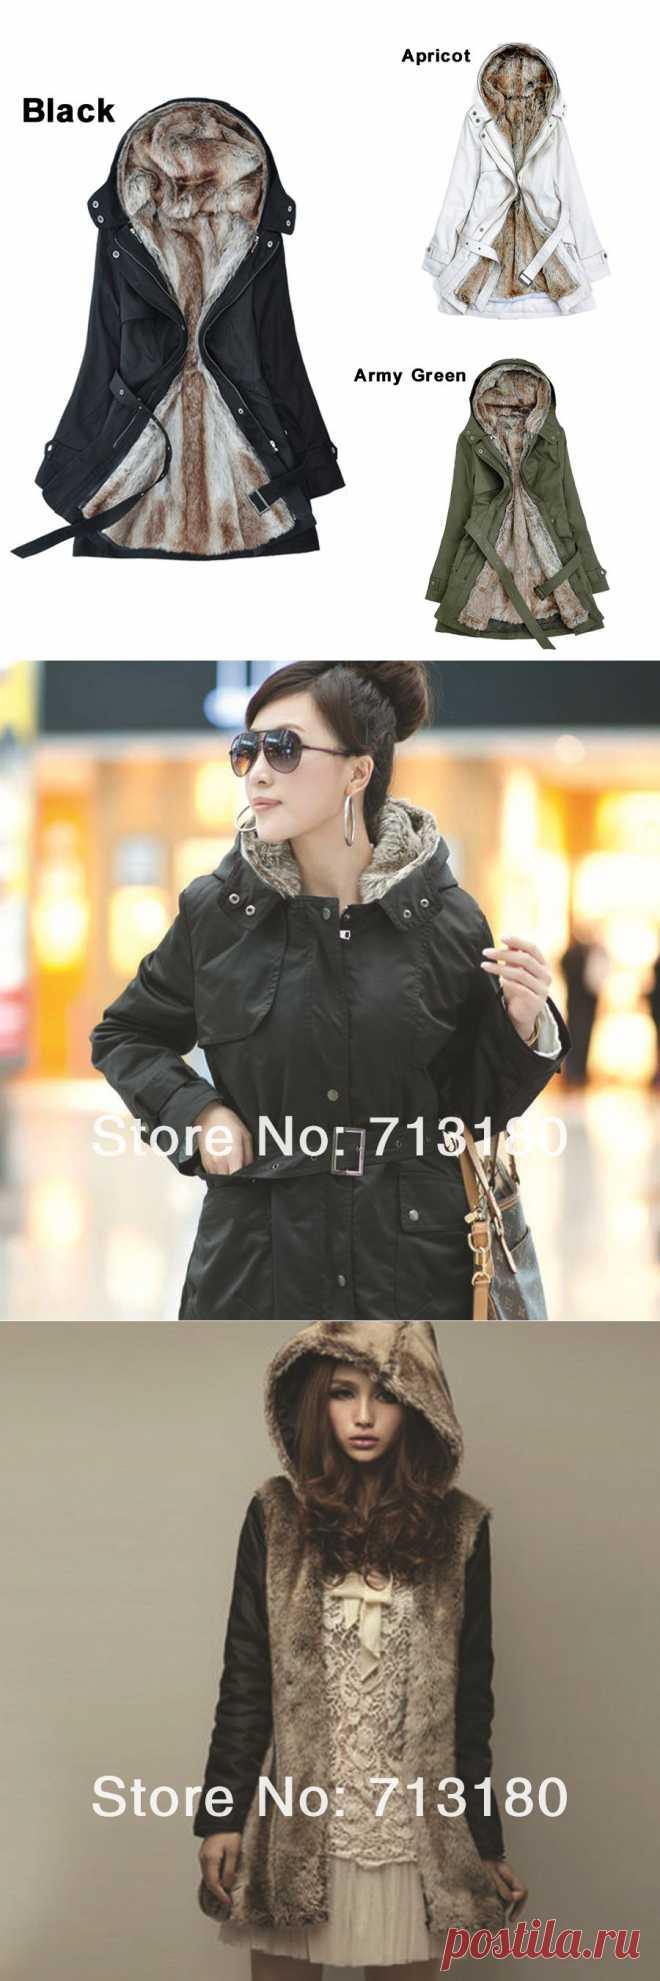 Двусторонее пальто на Aliexpress.com, 42,99$